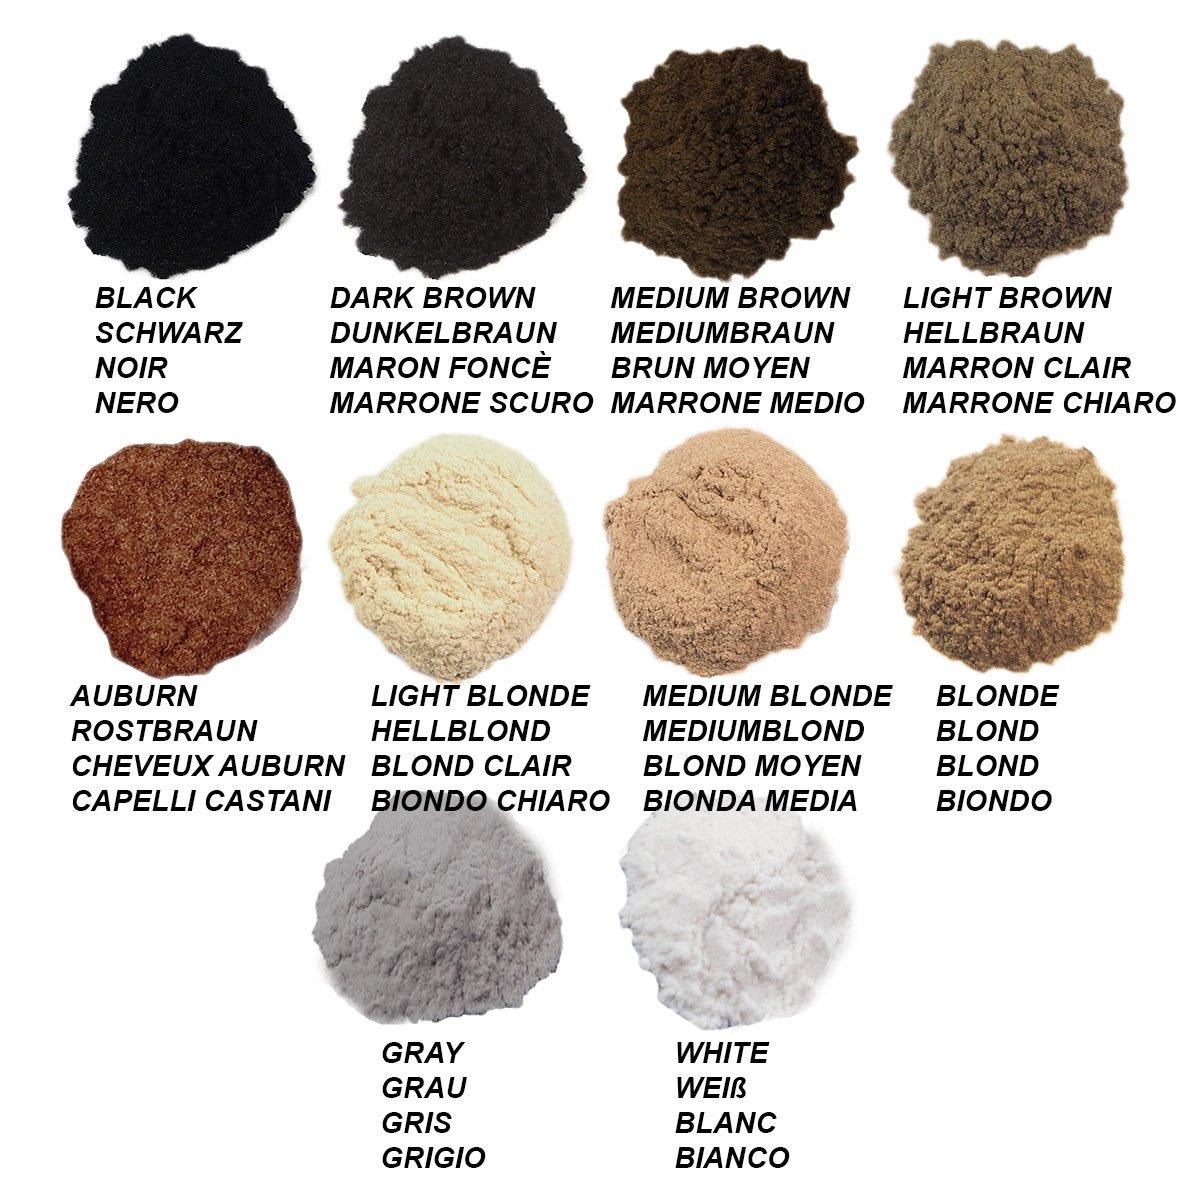 Charmate® HAIR FIBER PRO aufbauende Queratina pelo fibras Refill Pack 100 g: Amazon.es: Belleza